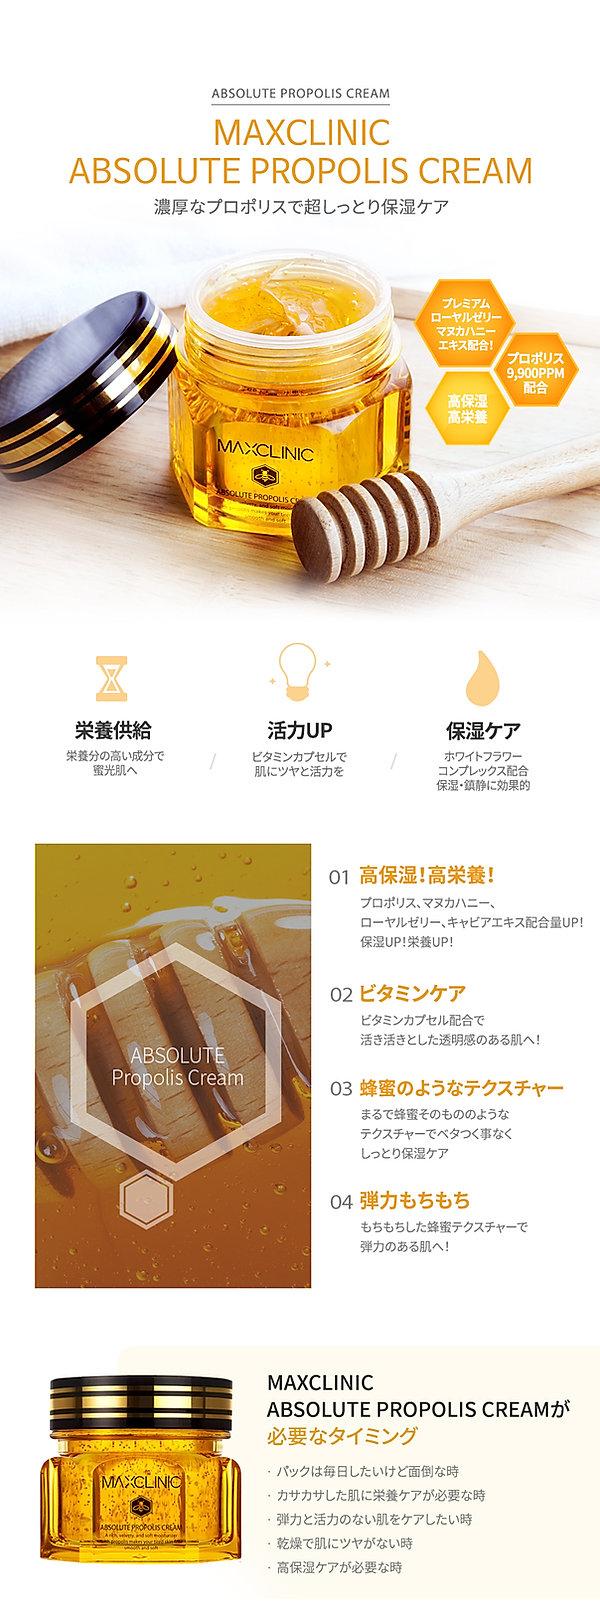 propolis_cream_jp_01.jpg